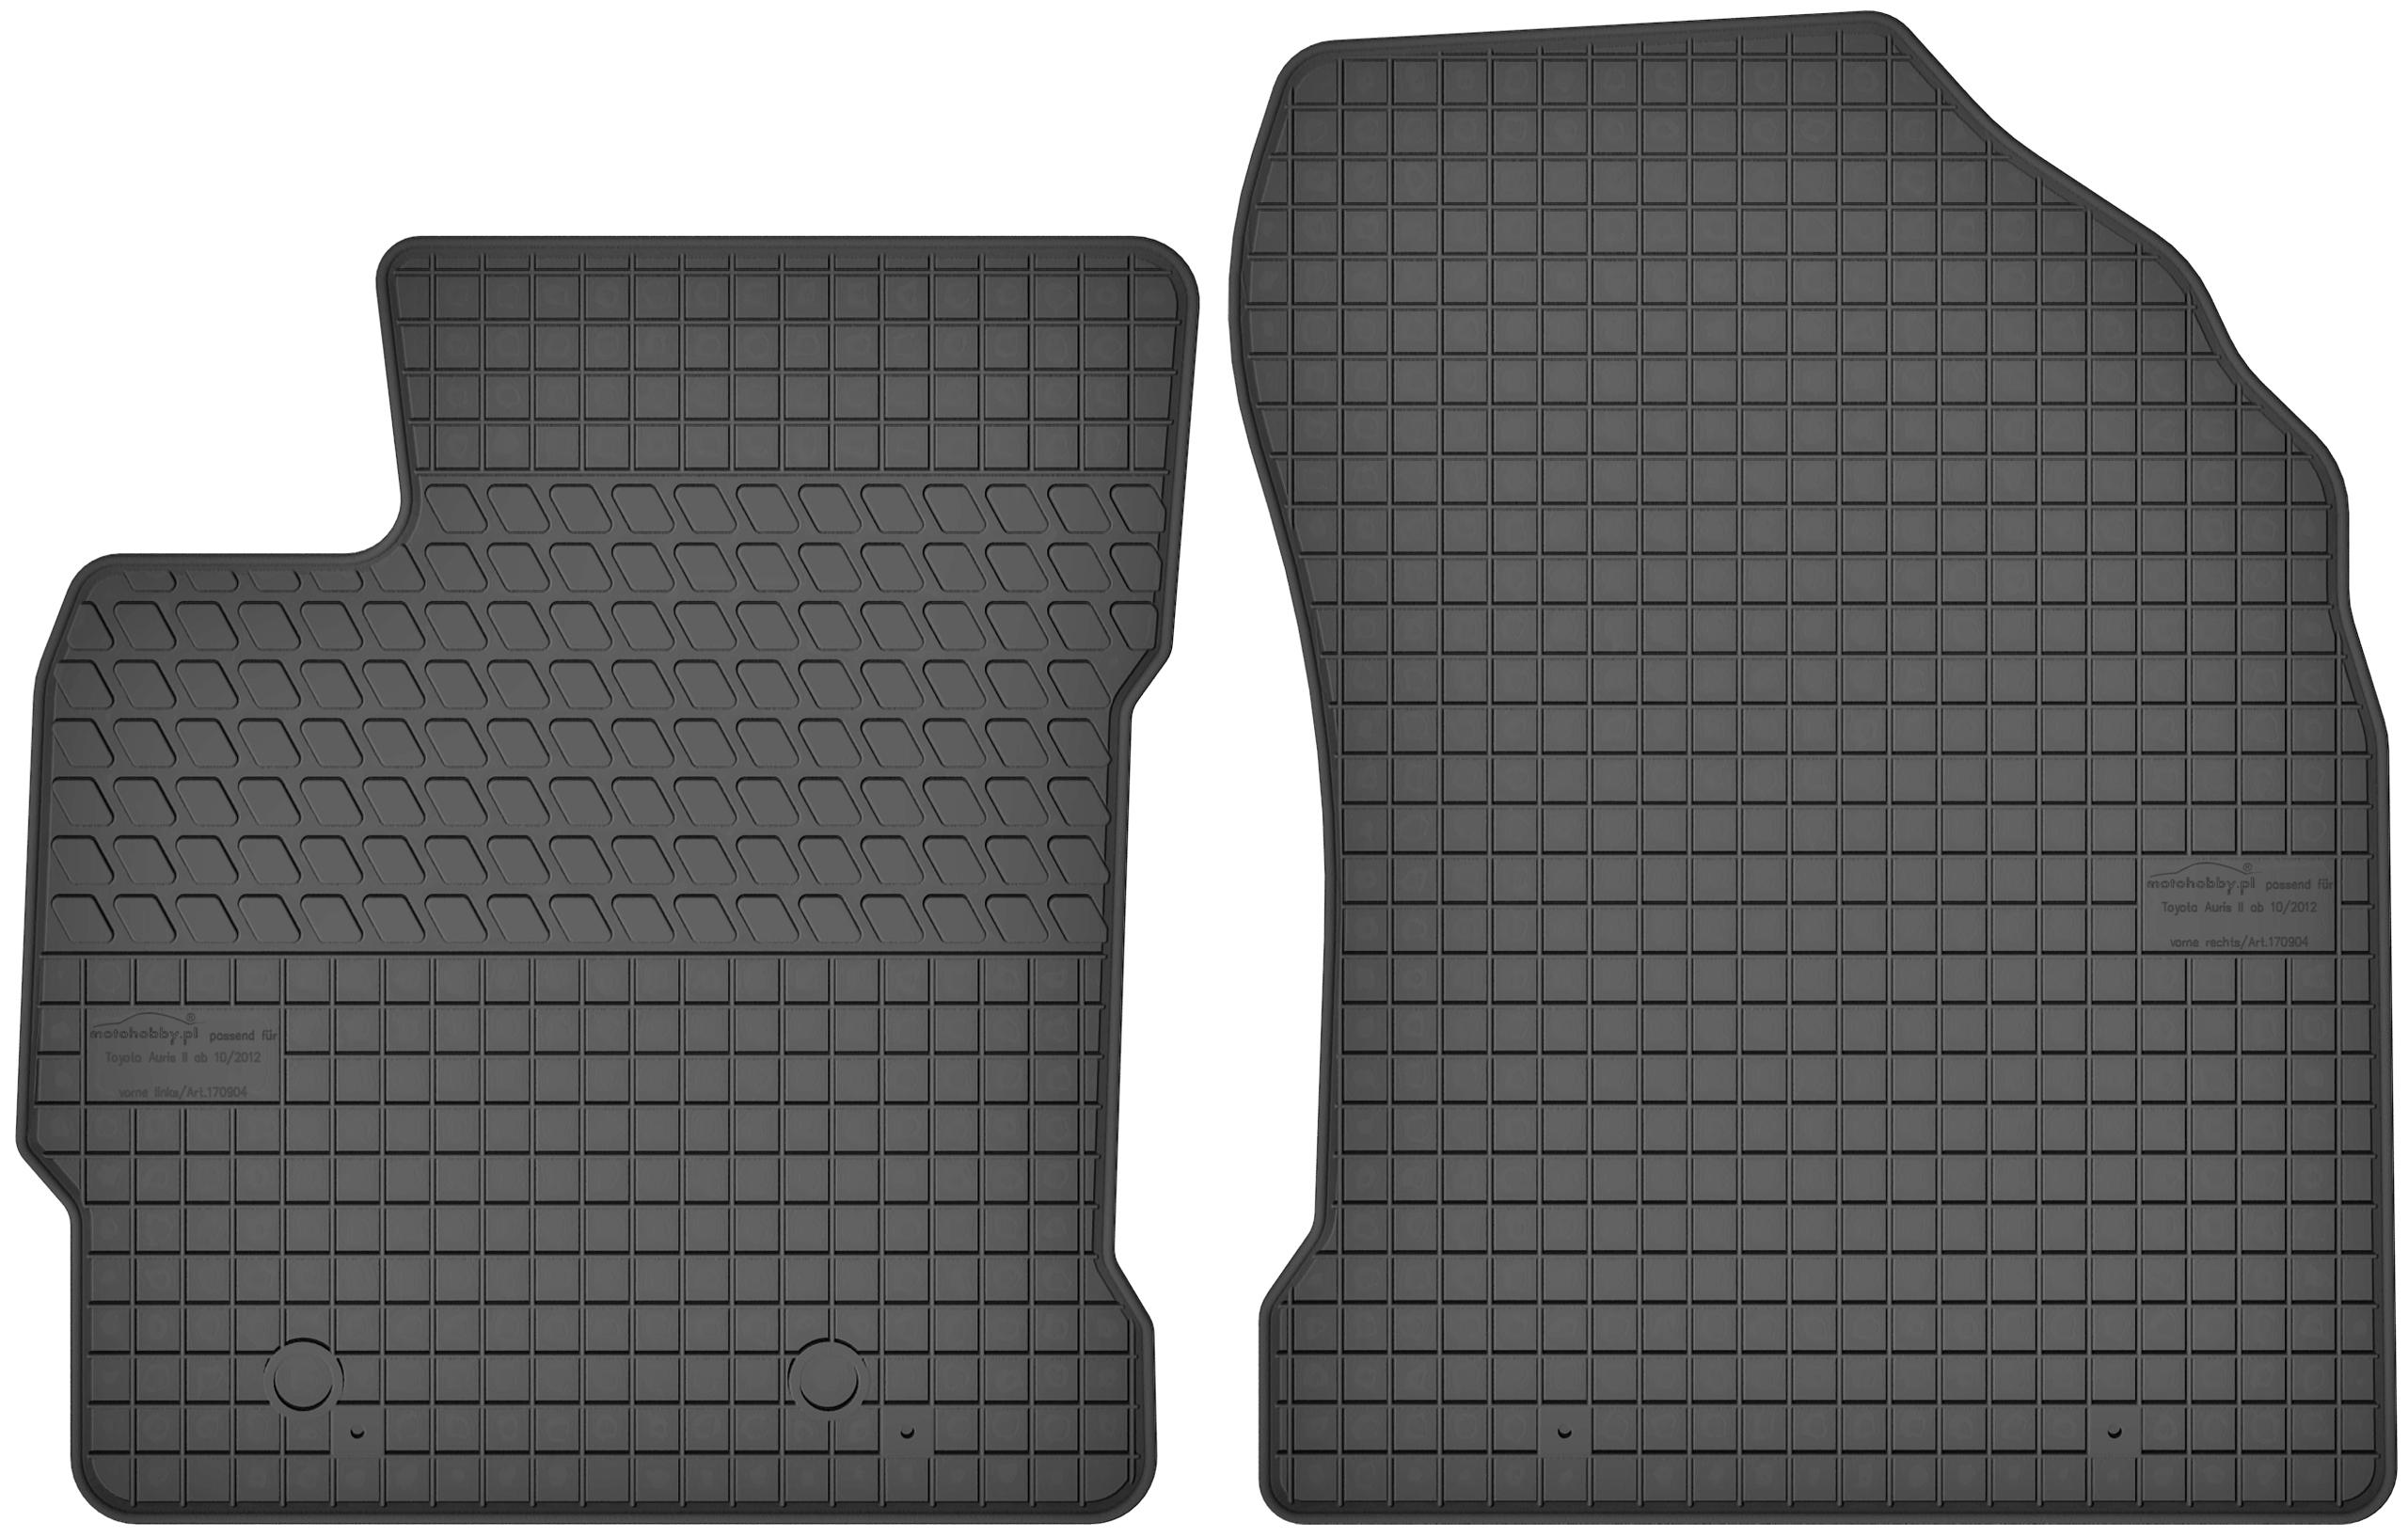 Gummimatten Gummi Fußmatten Matten Set Gummifußmatten Toyota Auris 2 E180 2012